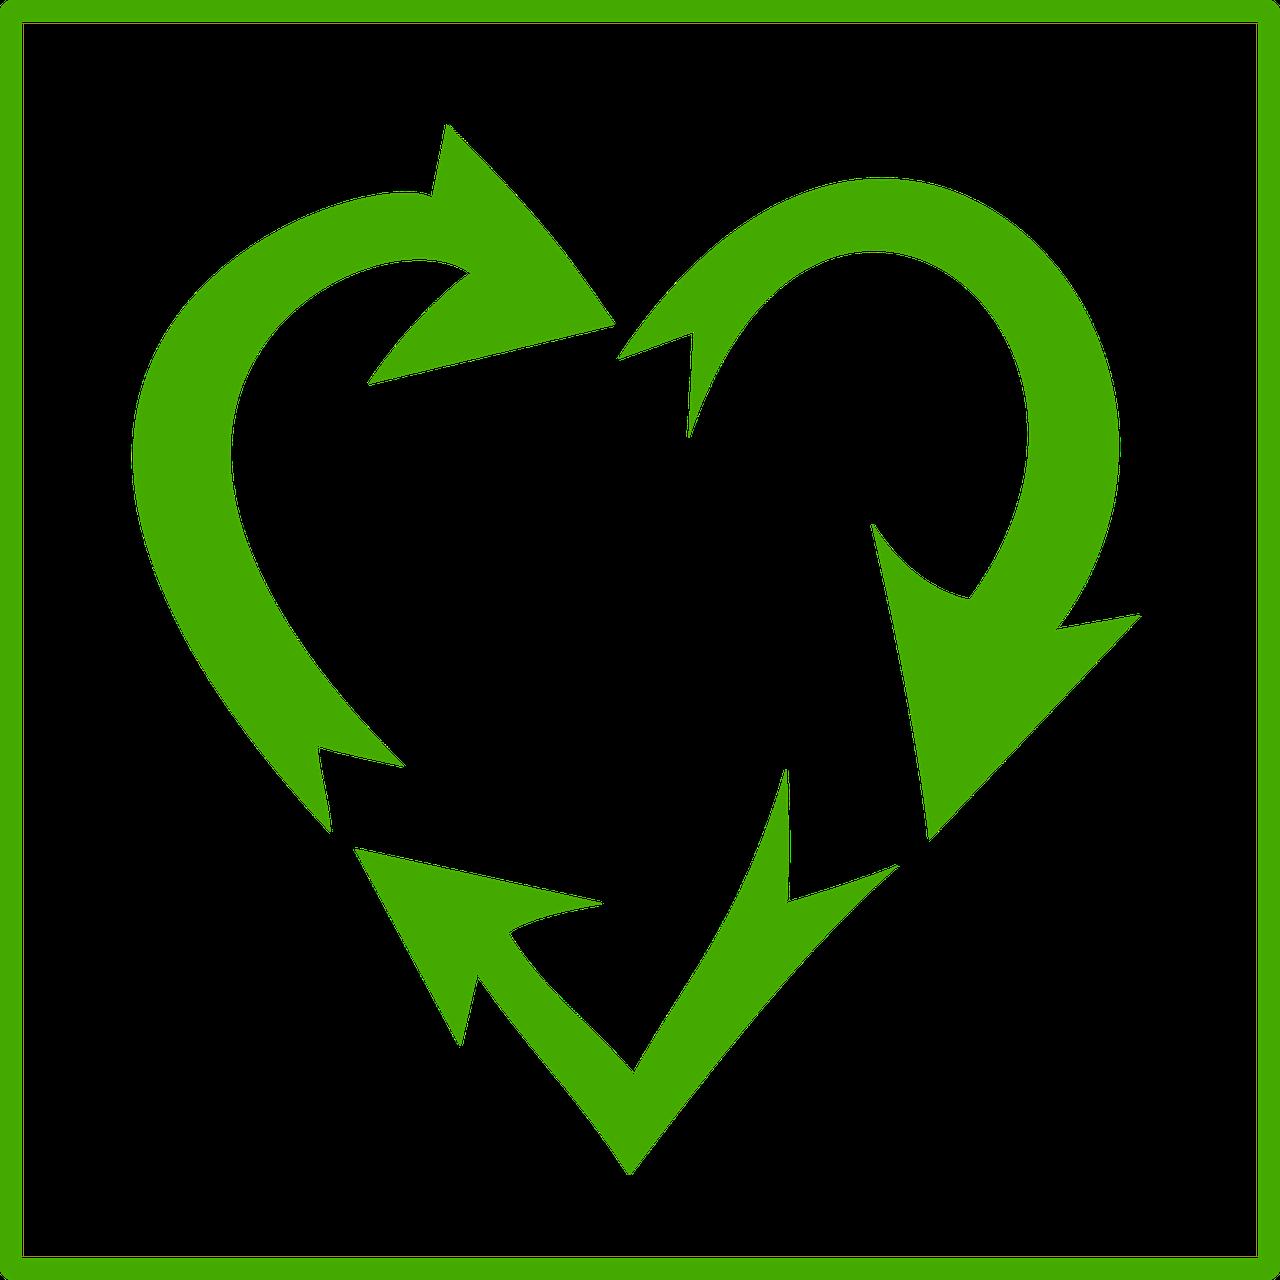 Rathdangan rubbish removal and waste disposal